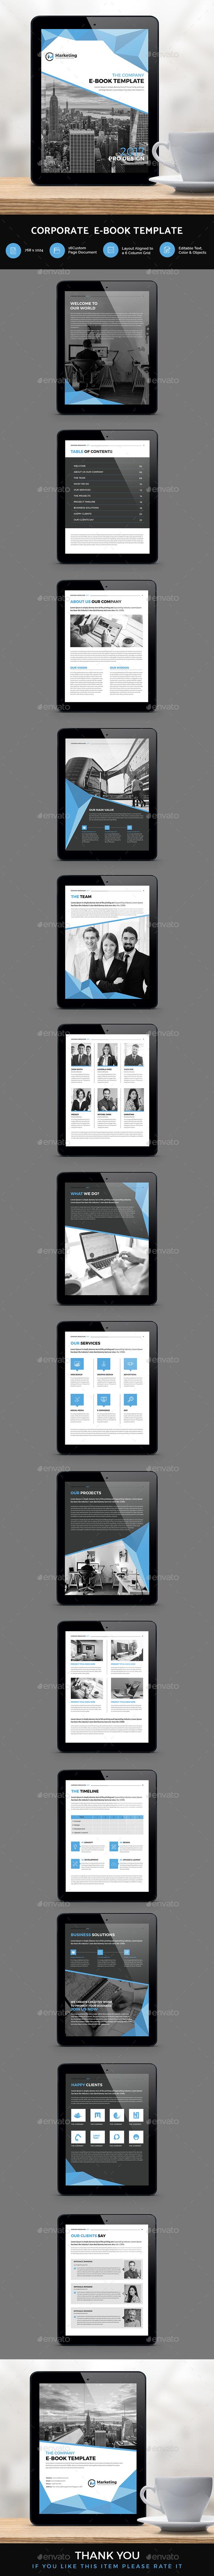 Corporate E-Book - ePublishing